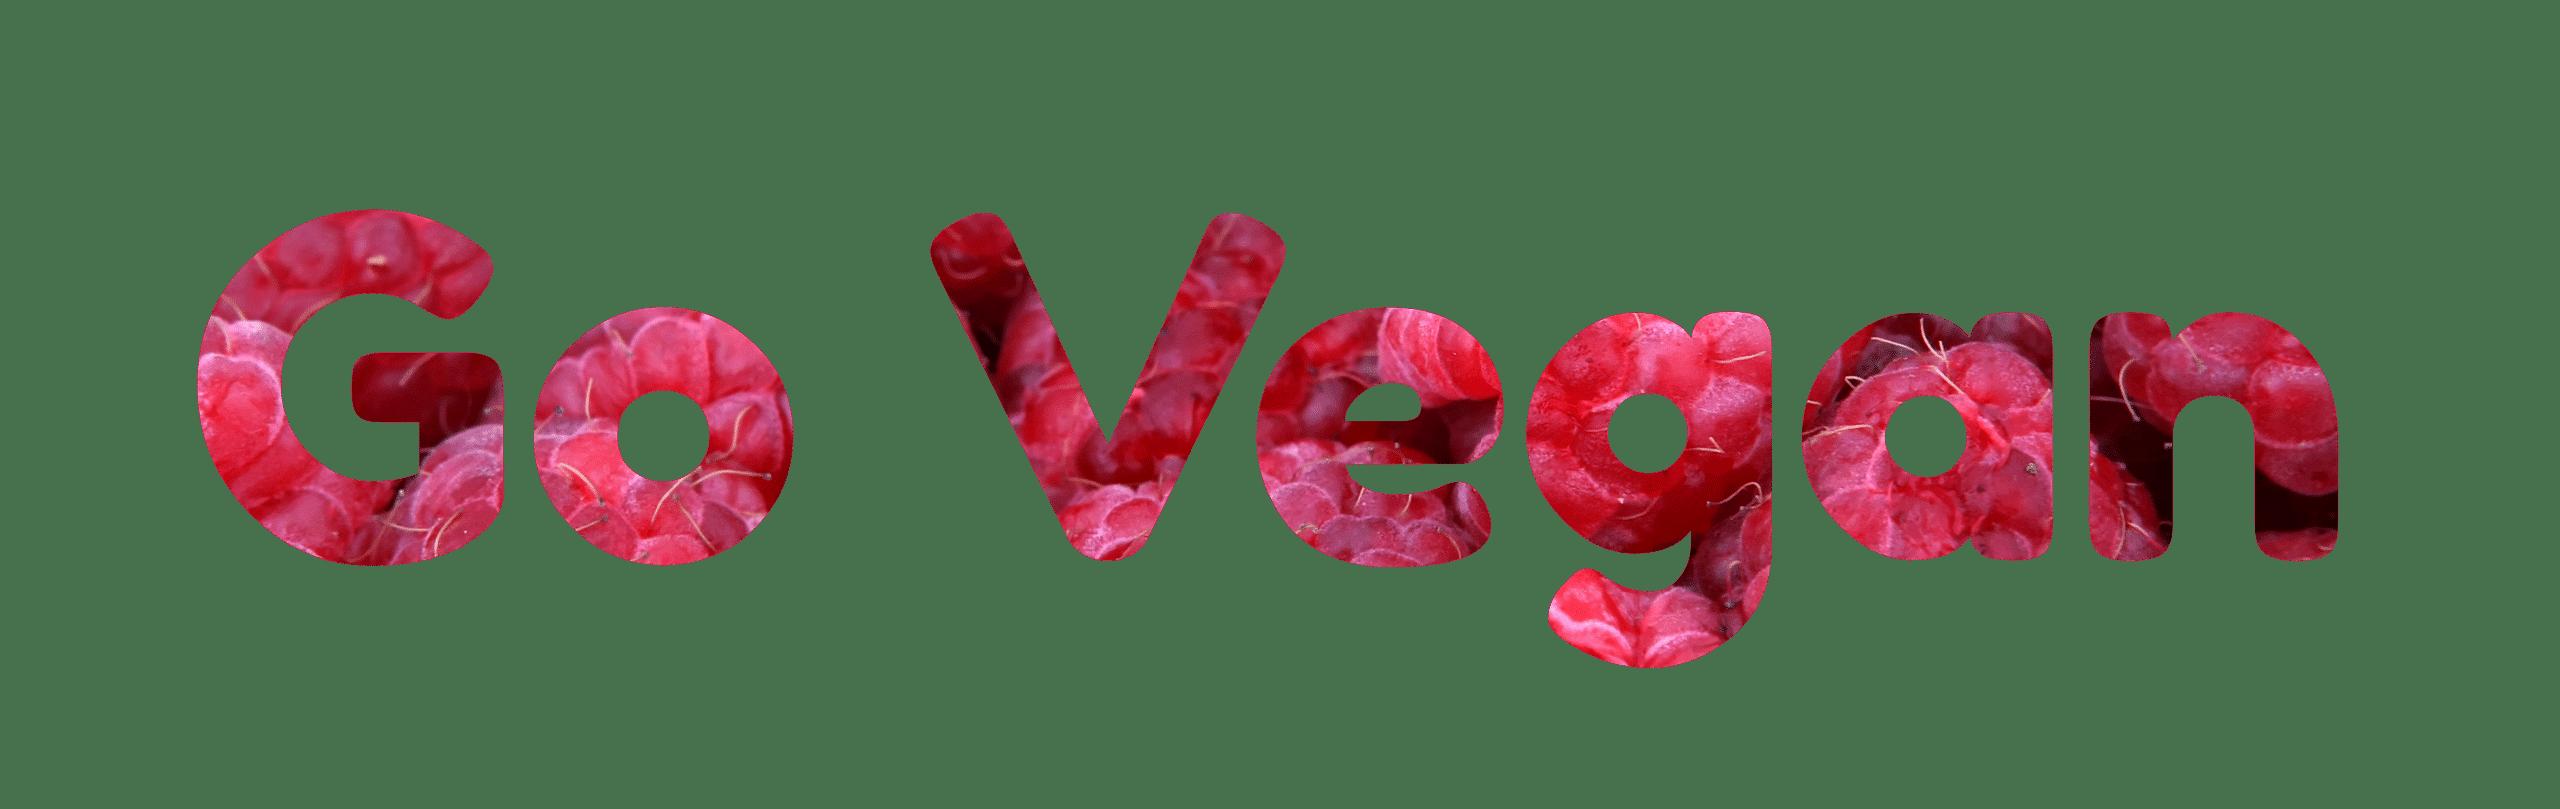 Why Vegan?